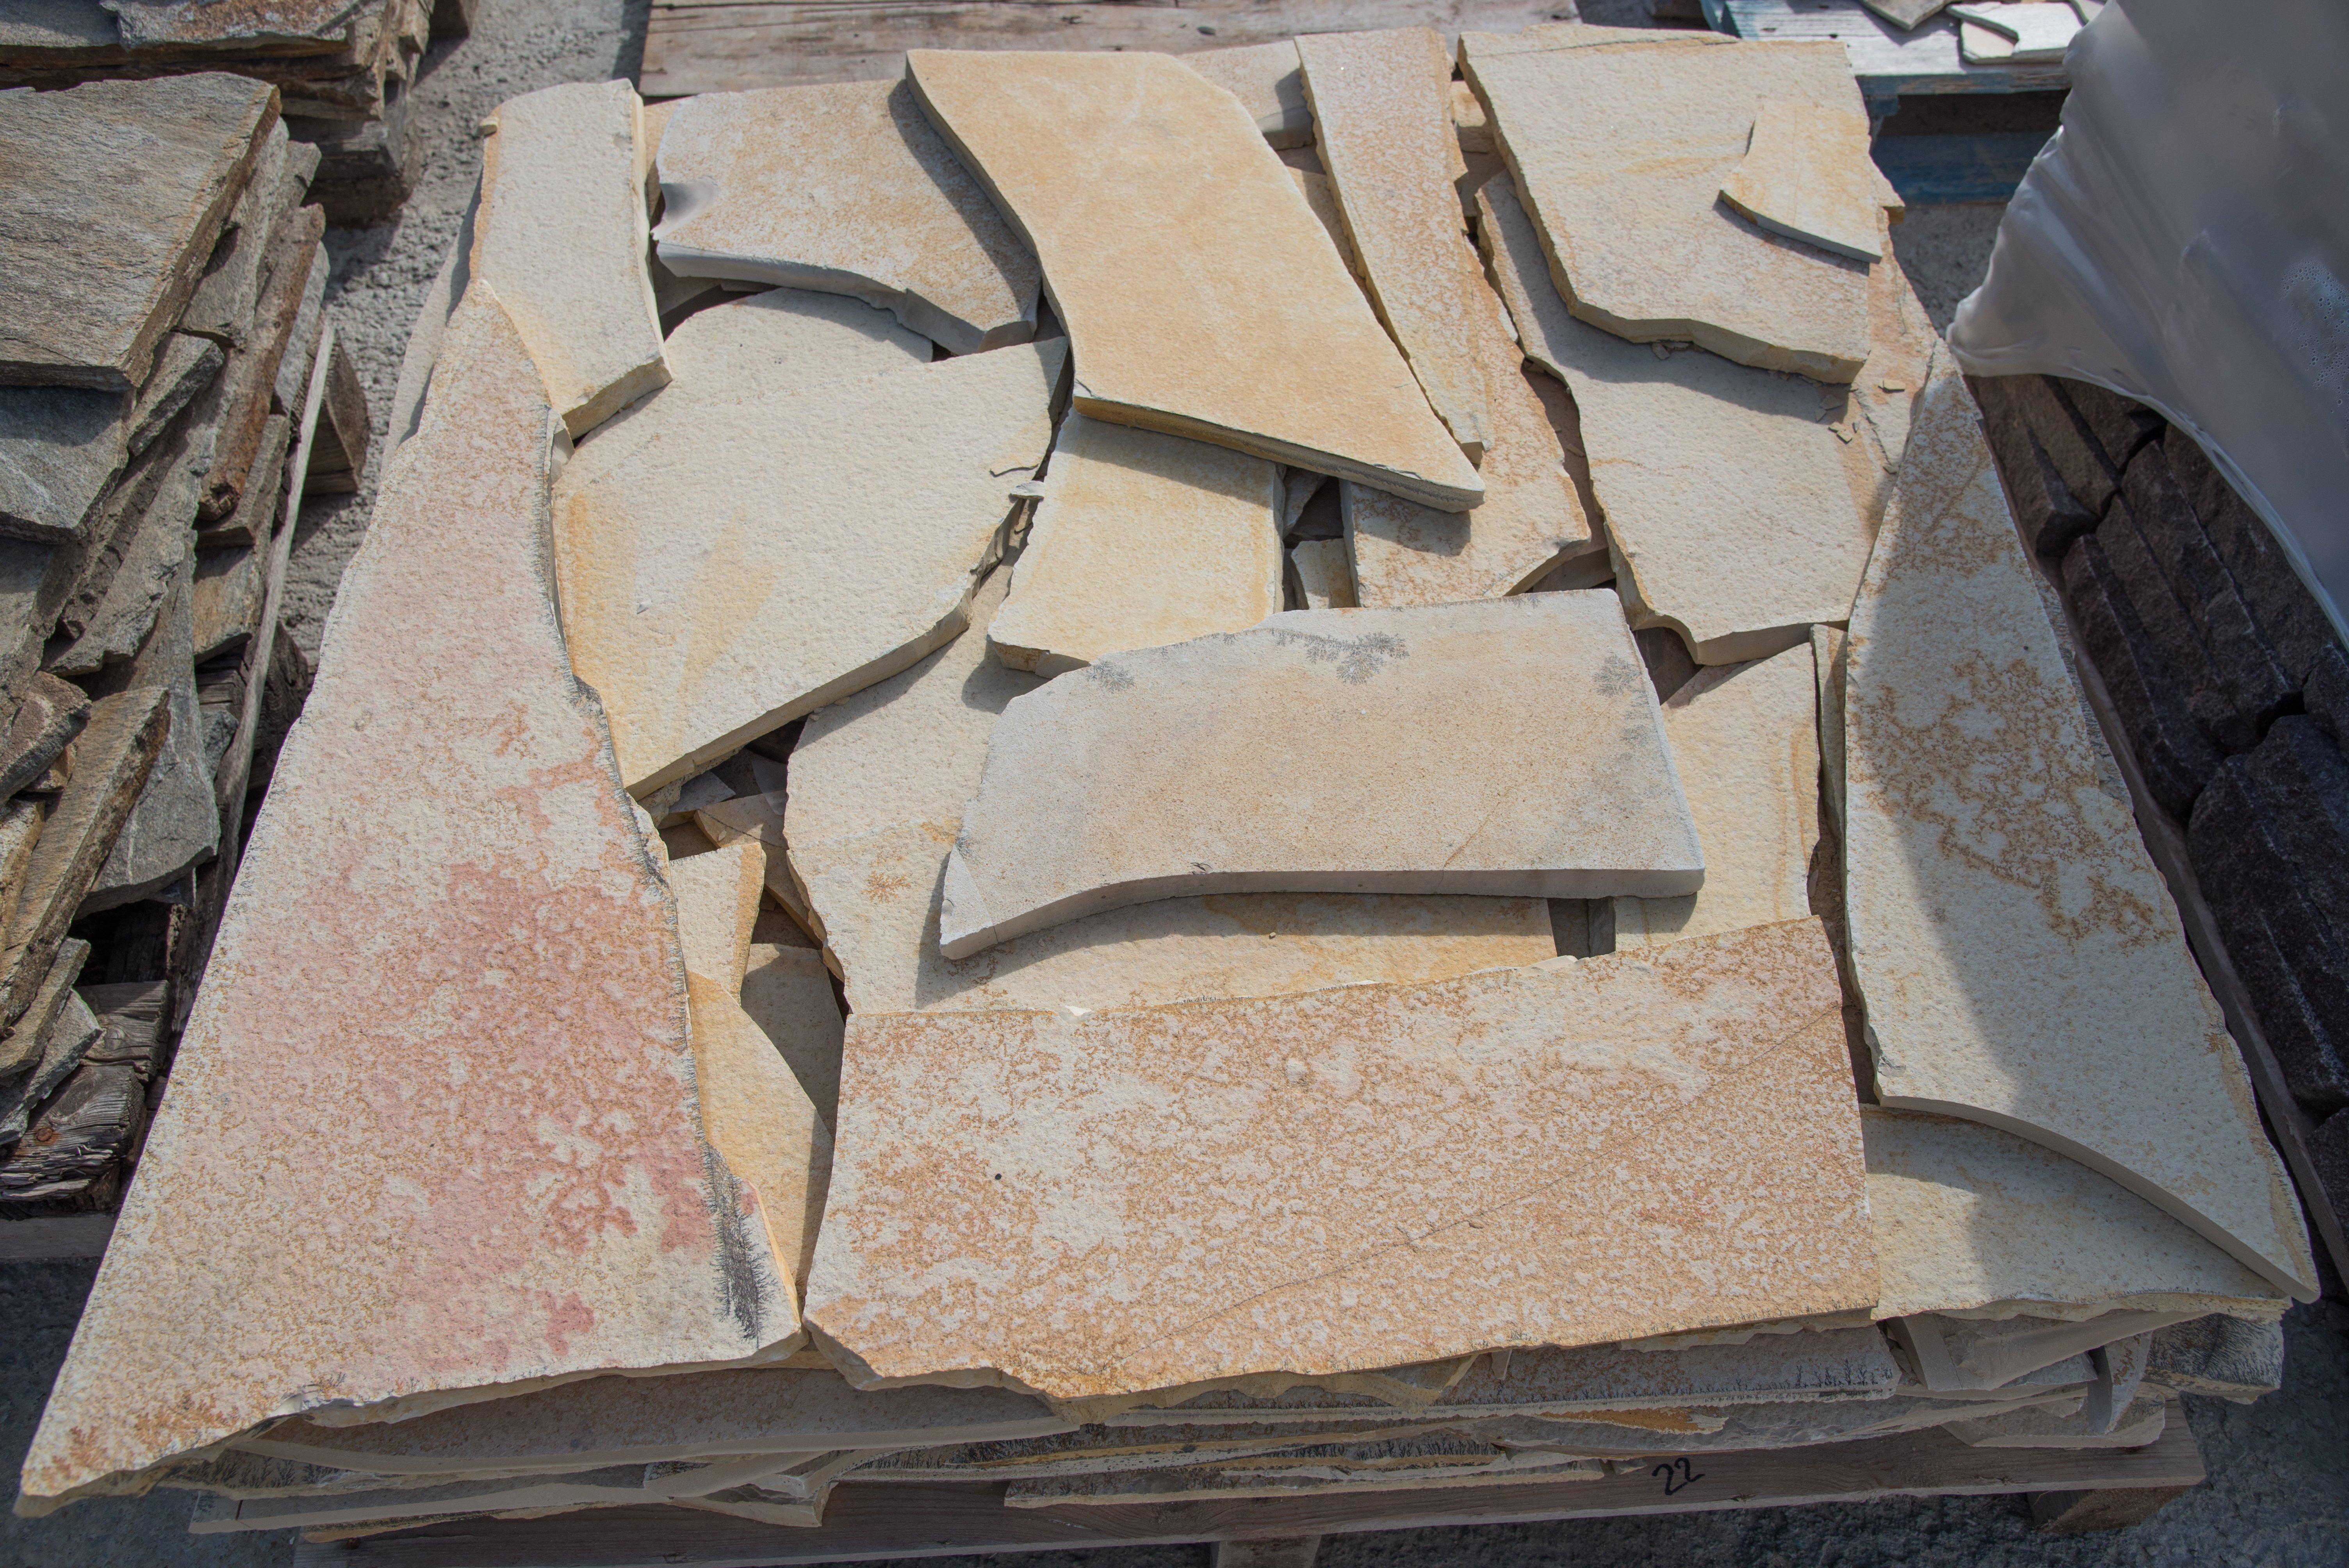 pietra di baviera - edil pietre 2P